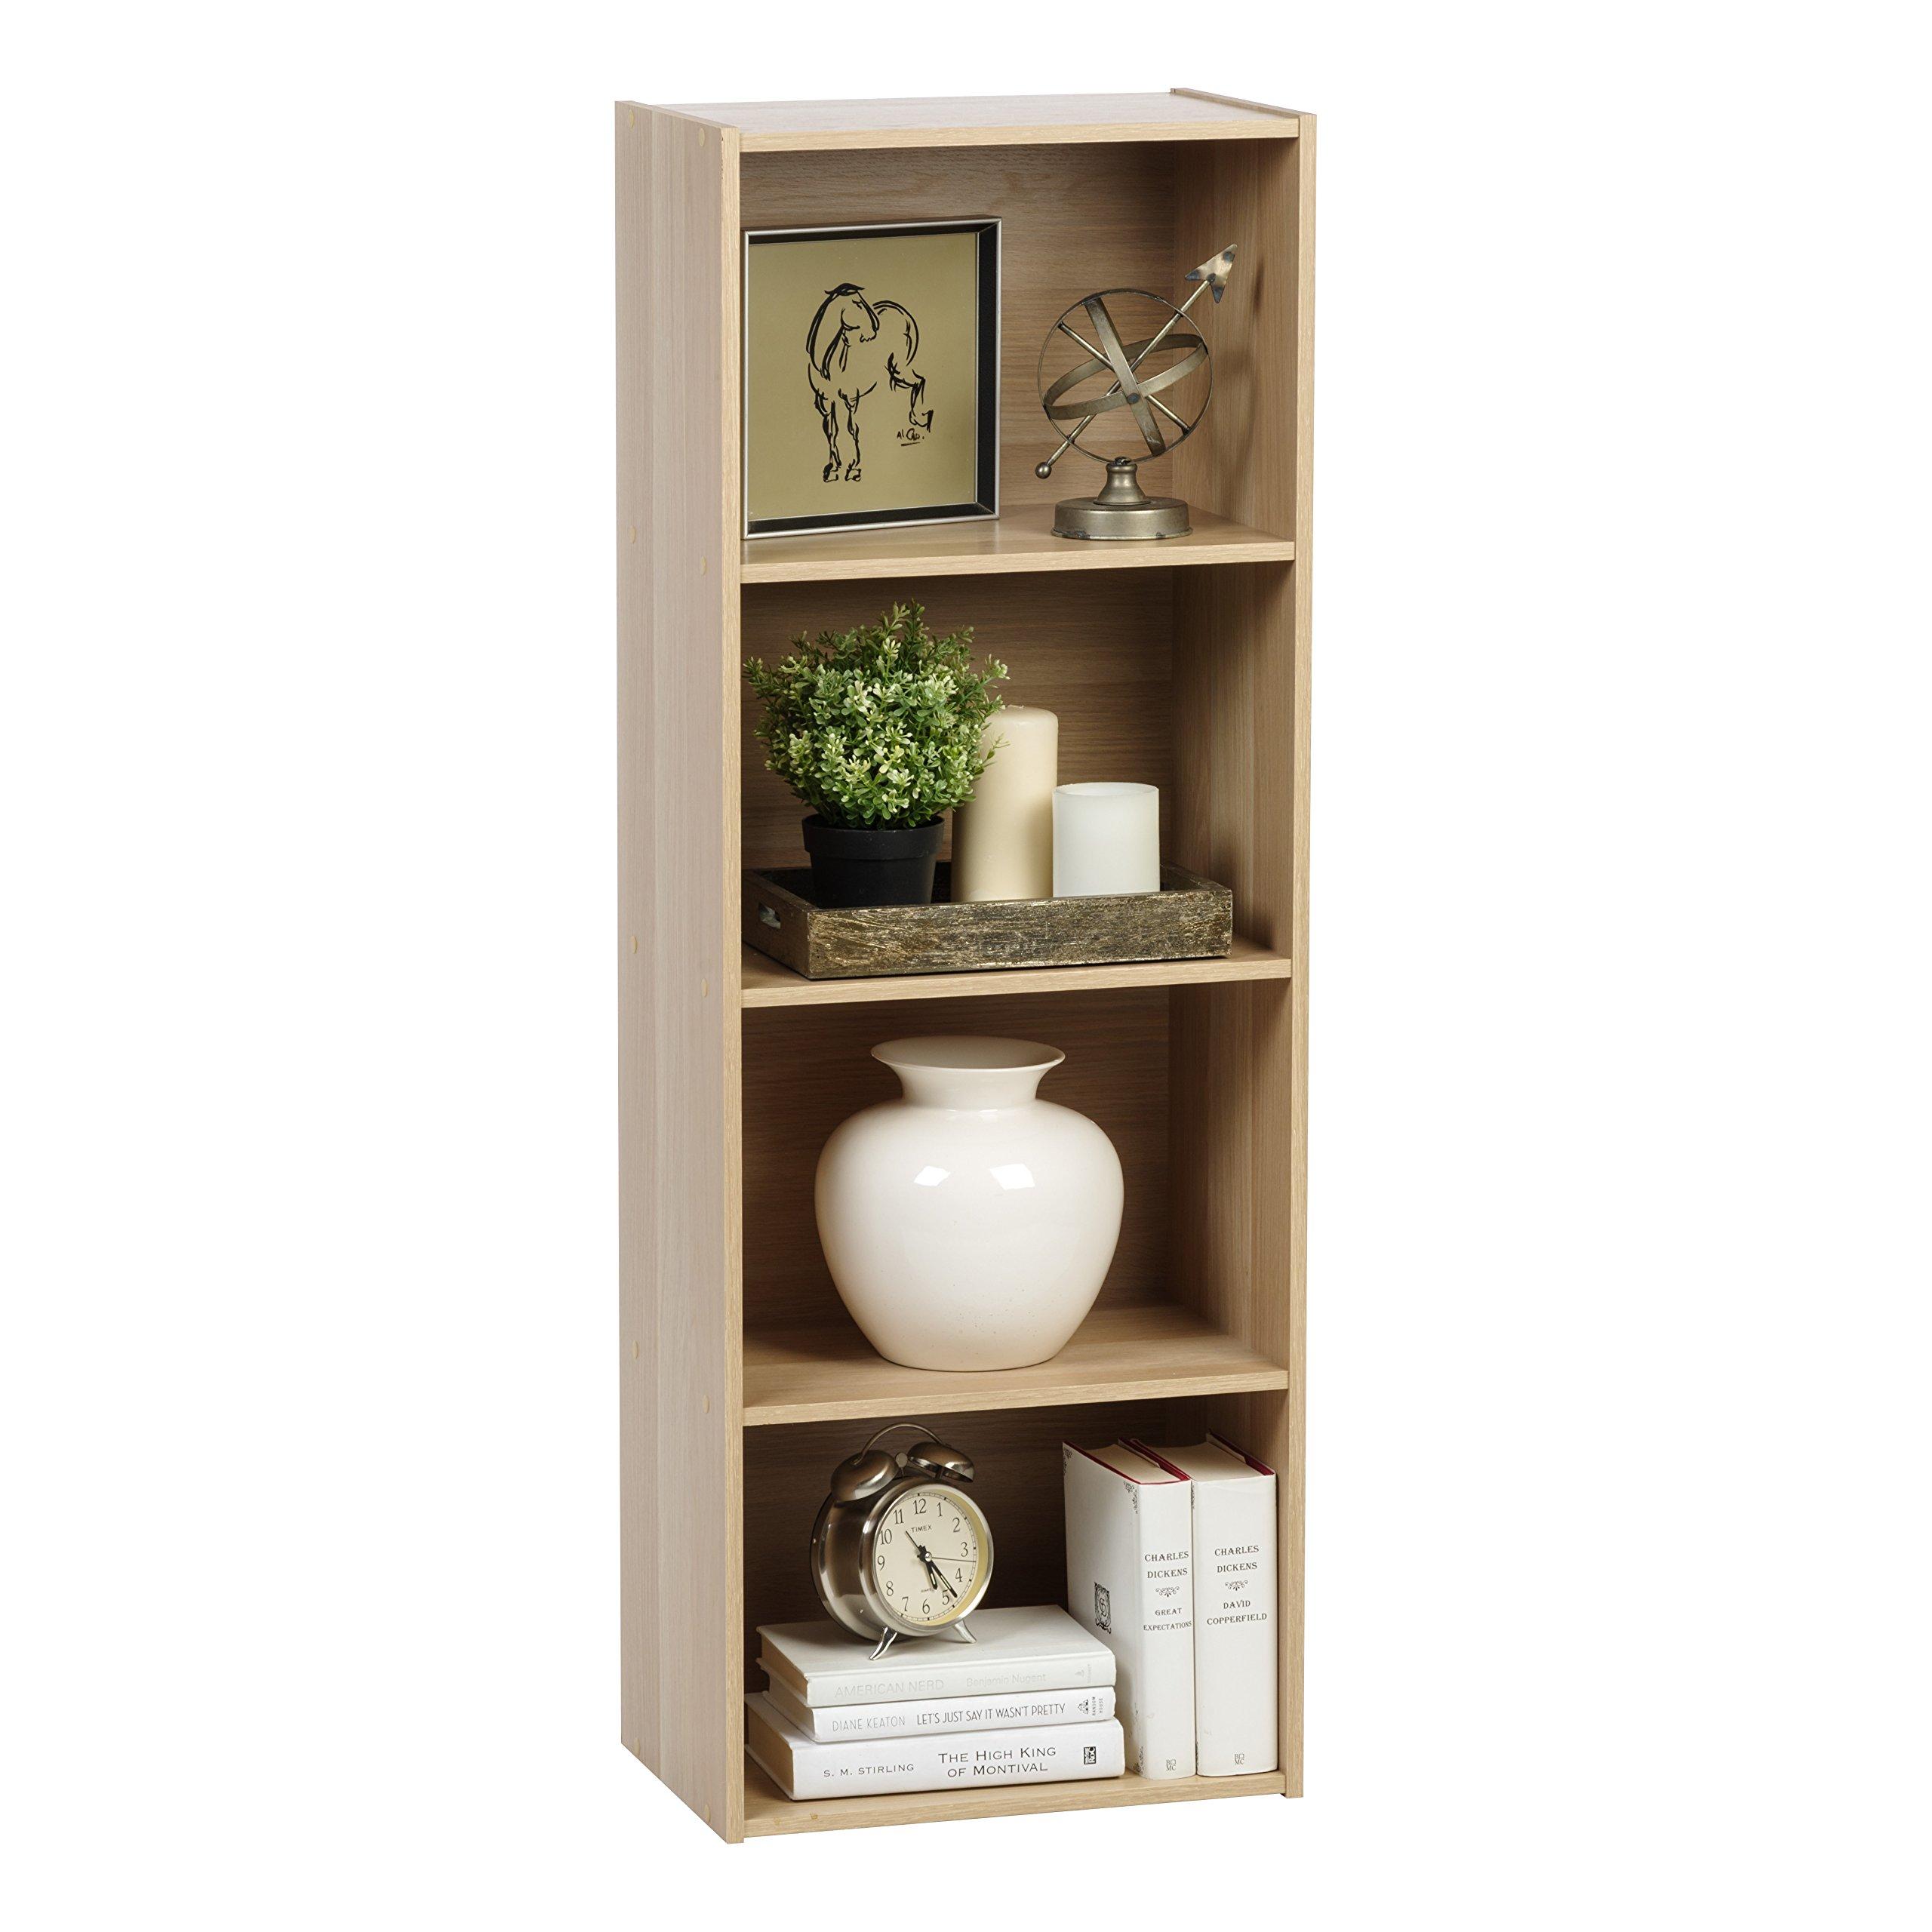 IRIS 4-Tier Wood Storage Shelf, Light Brown